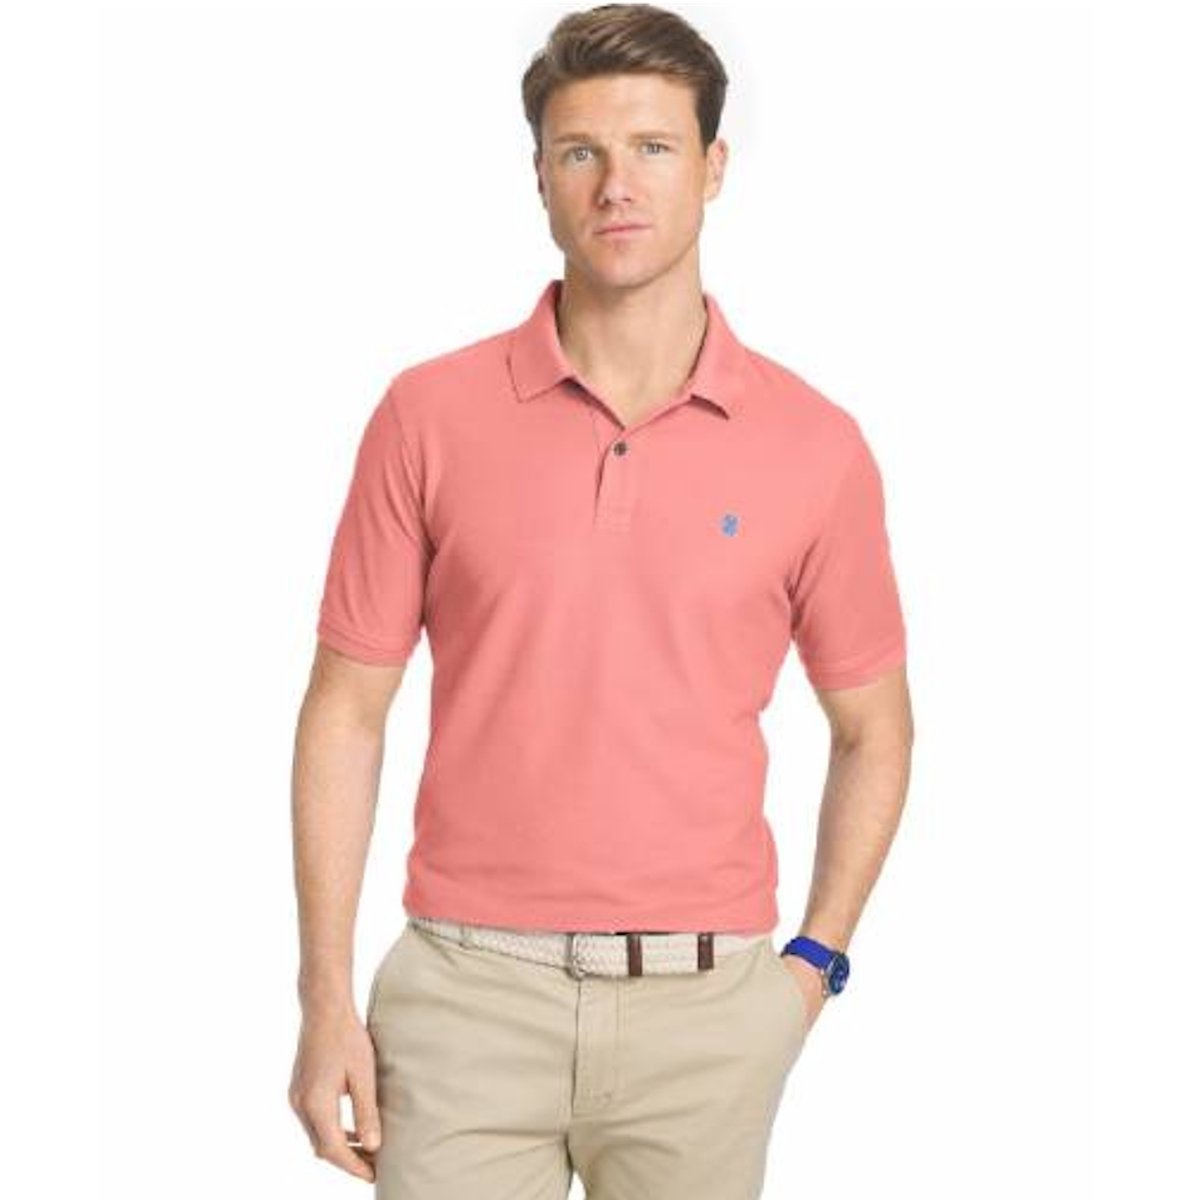 IZOD Men's Advantage Performance Easycare Plaid Short Sleeve Shirt, Rose of Sharon, Small